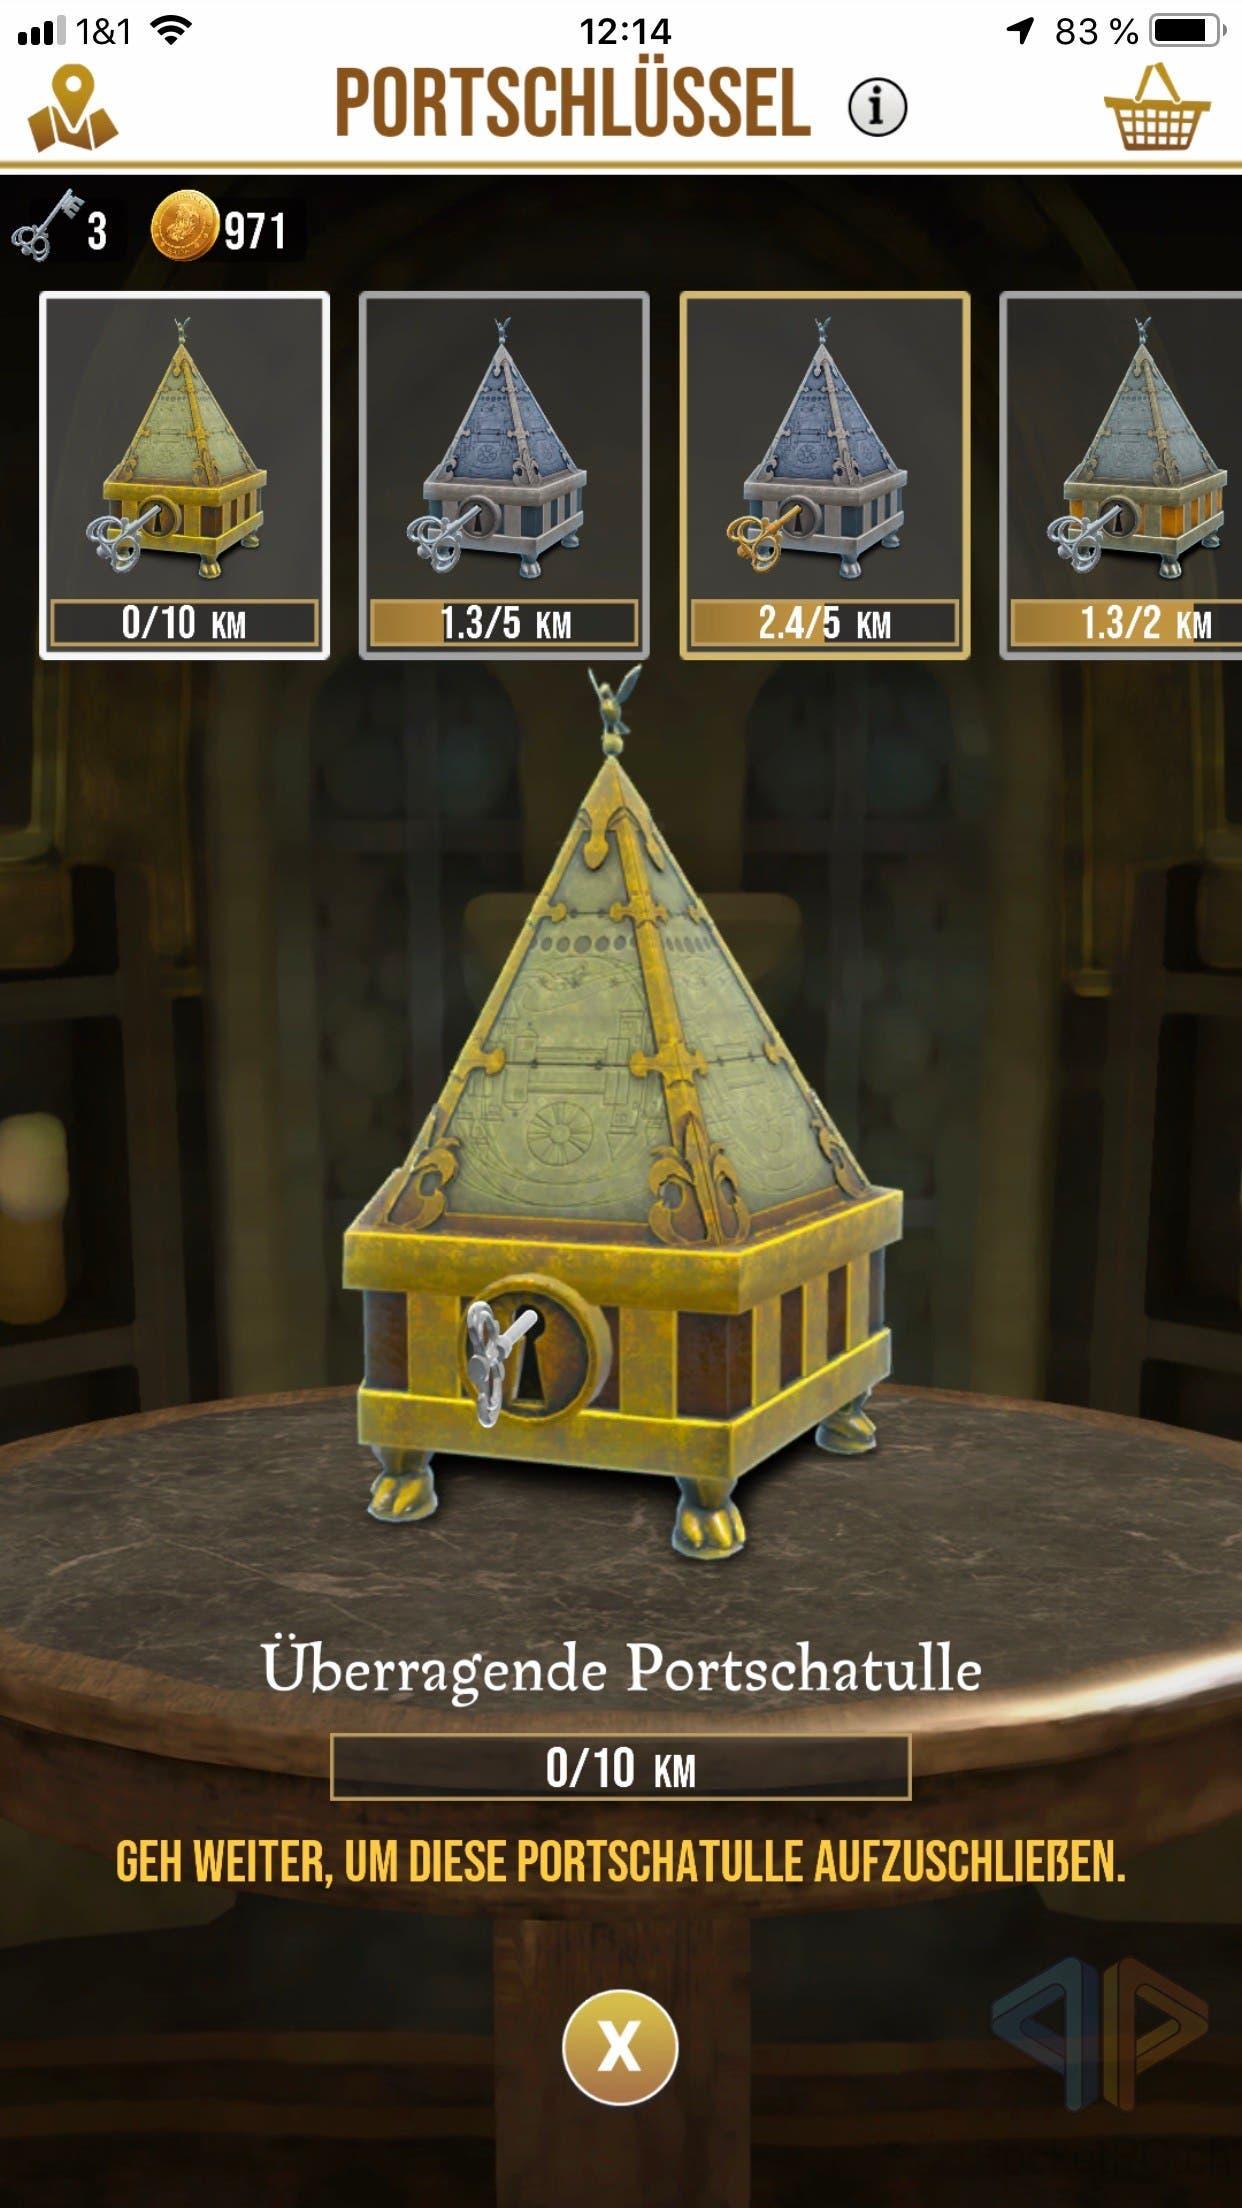 Harry Potter: Wizards Unite Portkeys